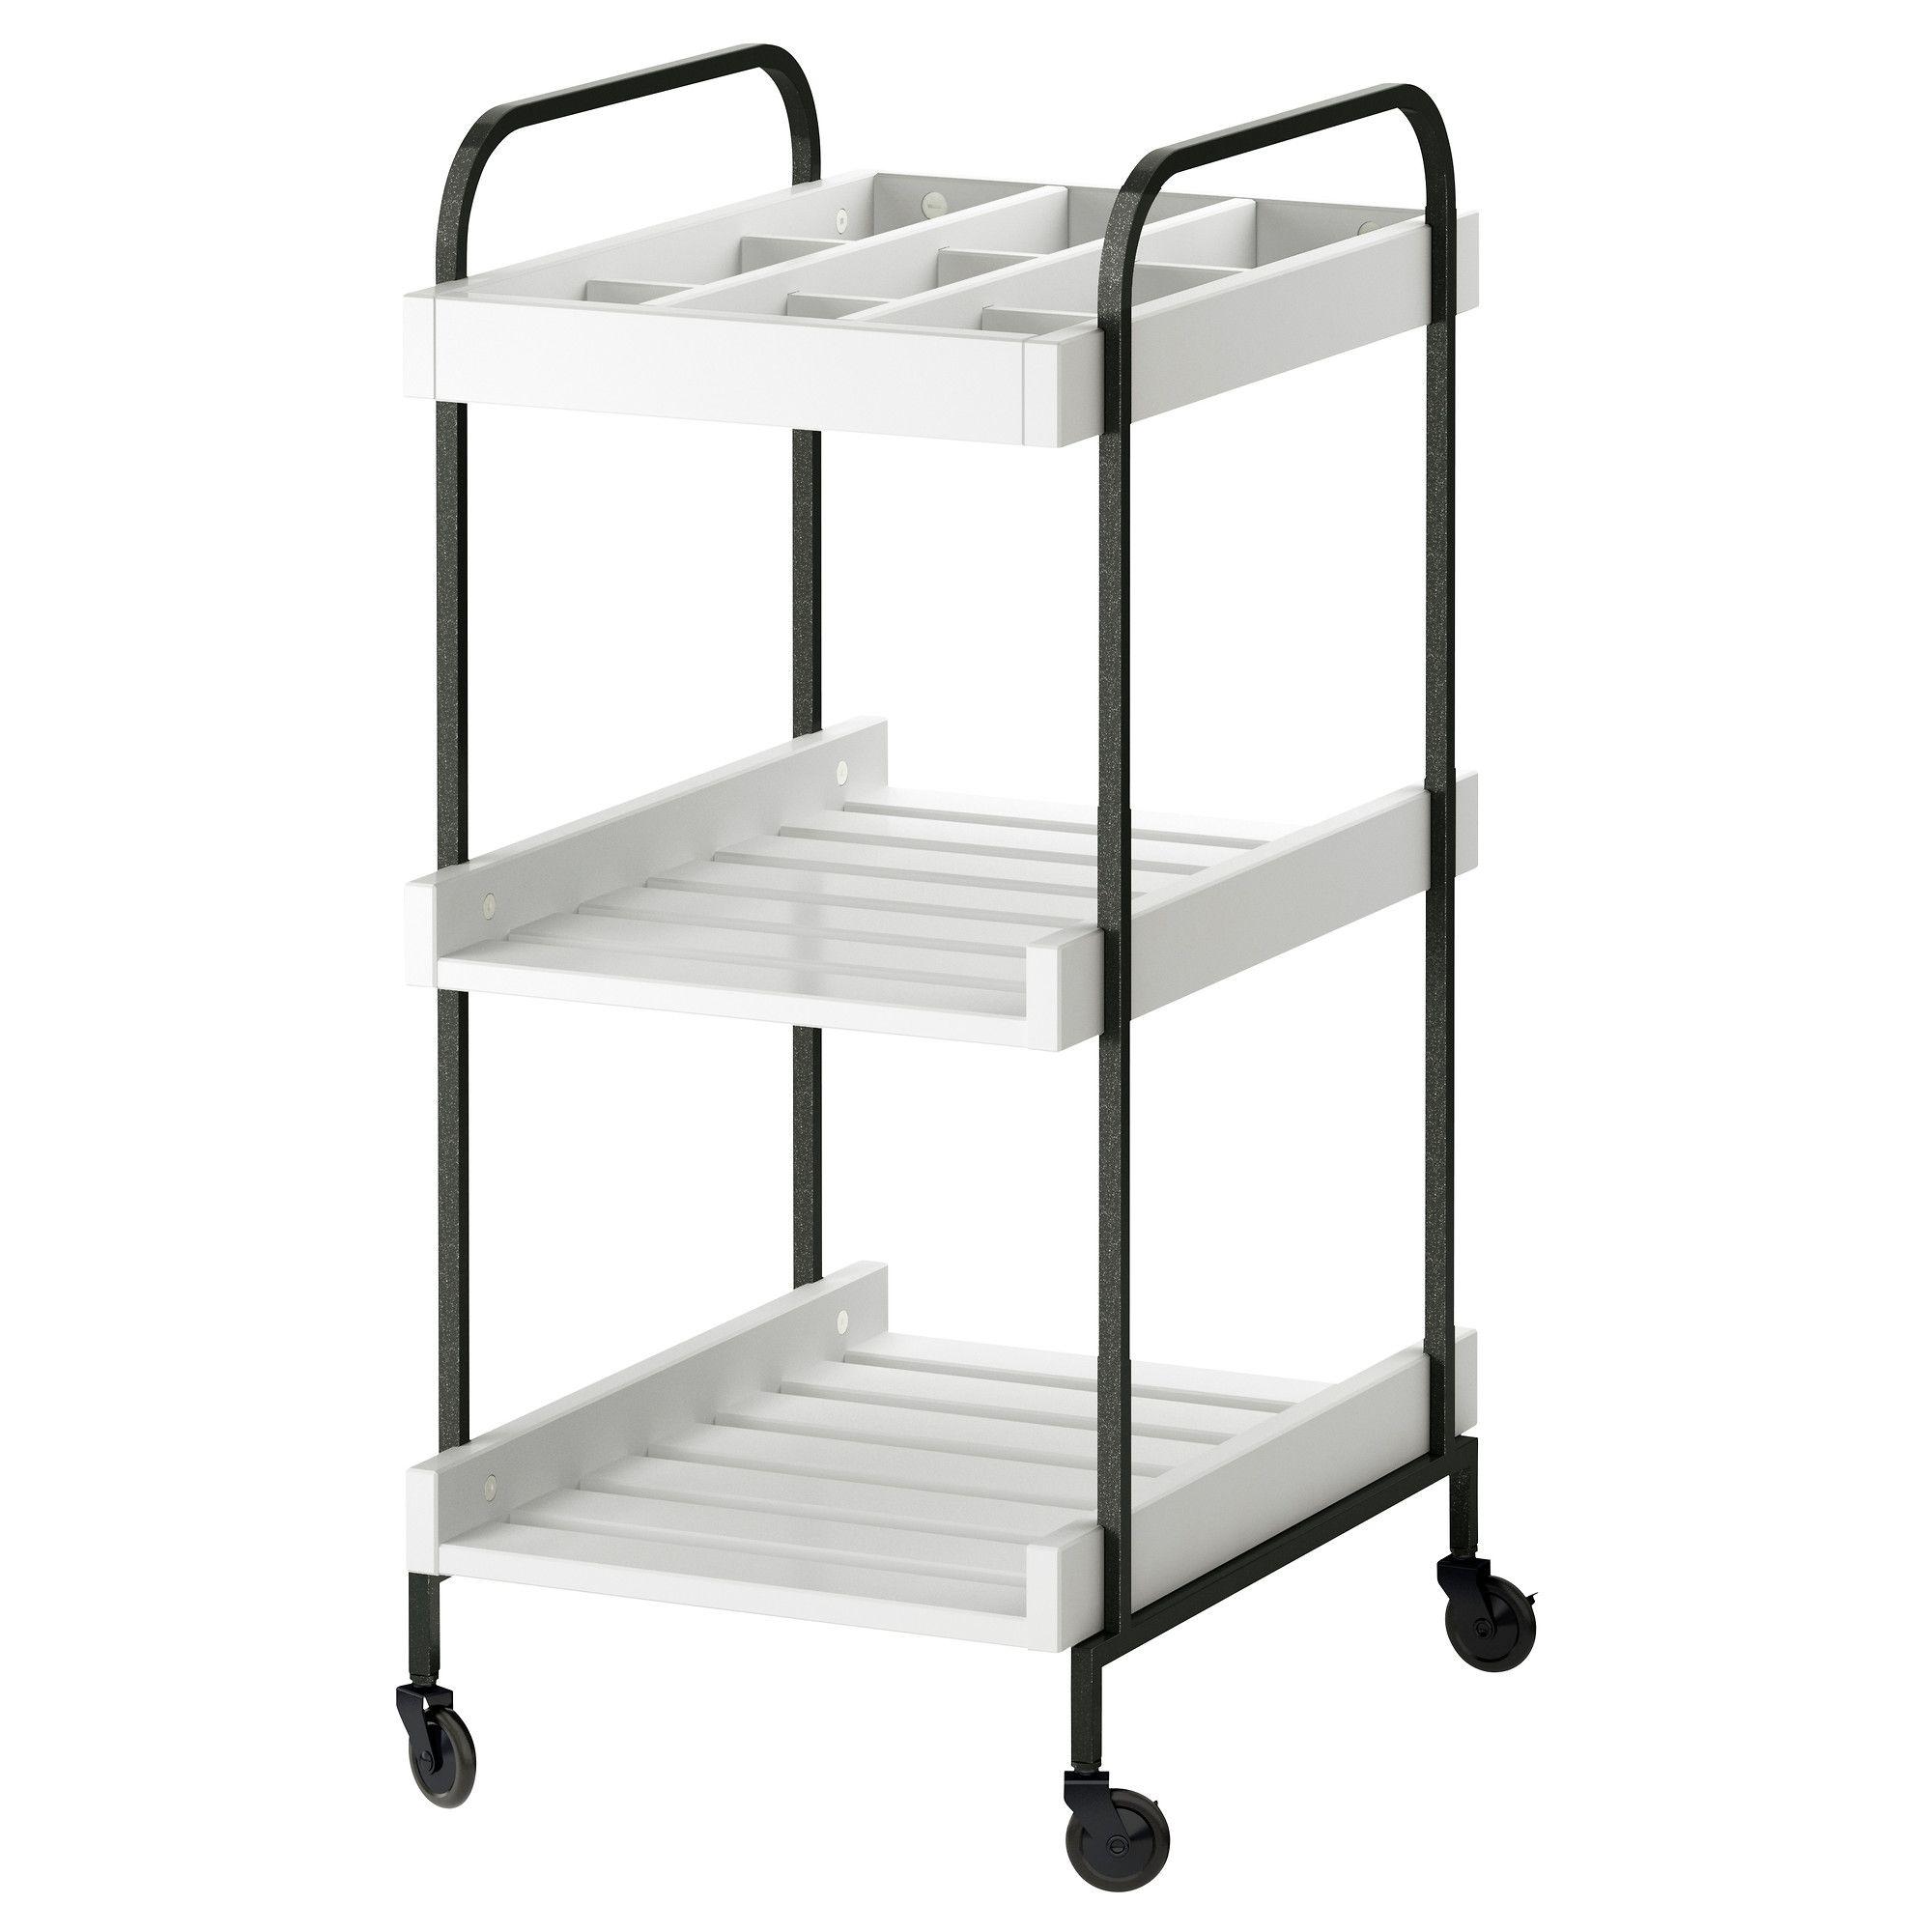 7ae9eb1d6abf272b1c73ec5c1f73cfff Incroyable De Table Balcon Suspendue Ikea Concept